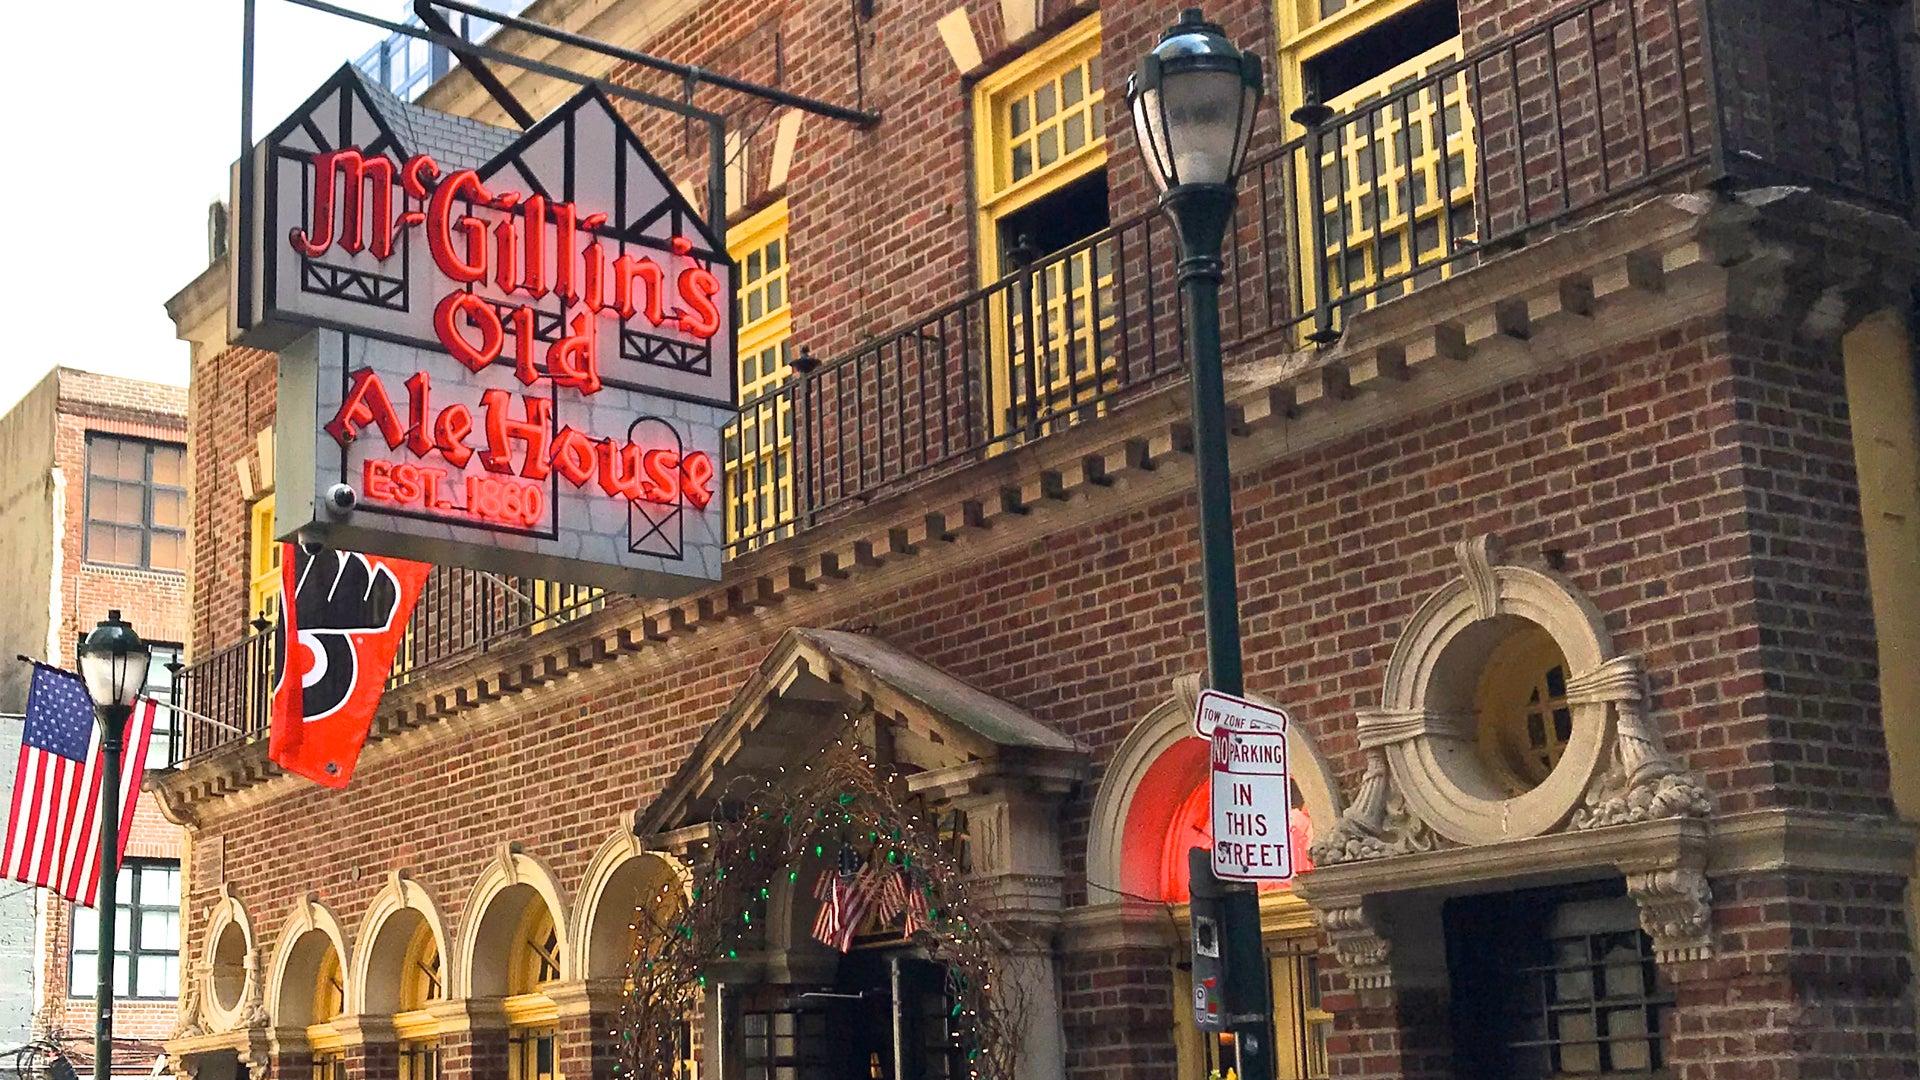 McGillen's Olde Ale House